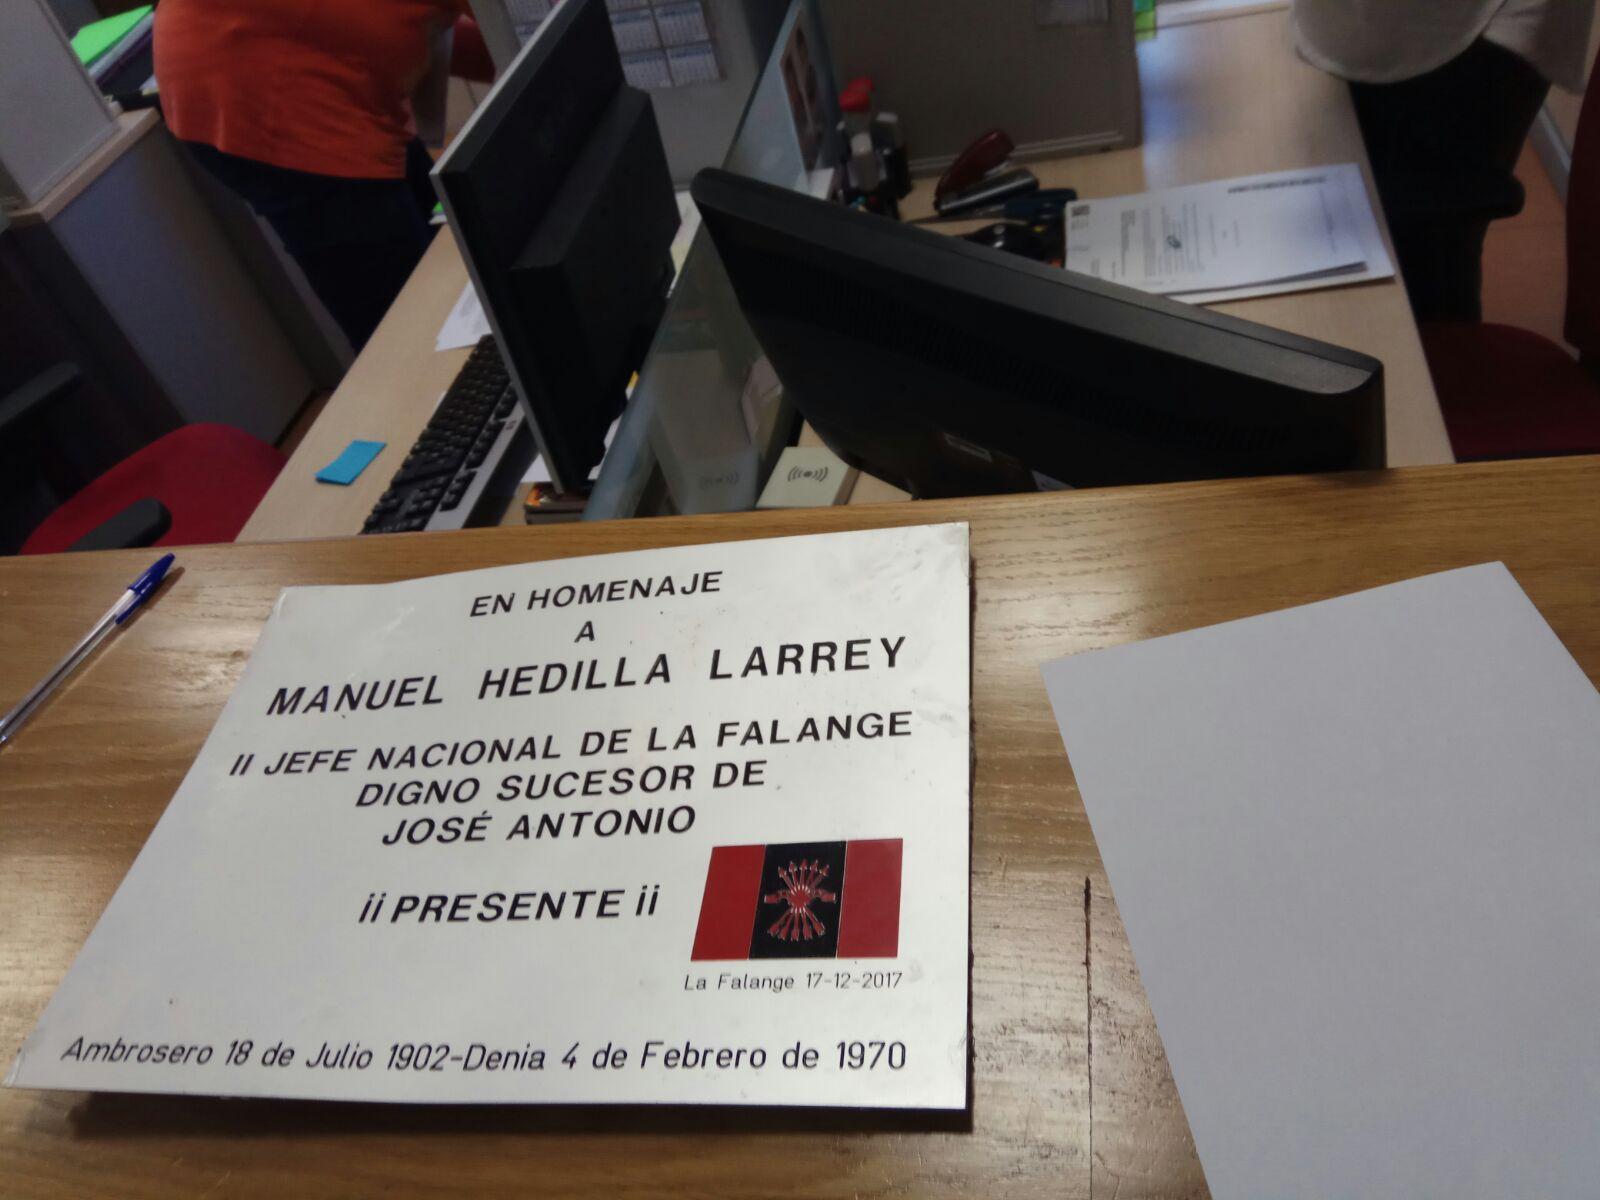 Recuperada la placa de homenaje a Manuel Hedilla